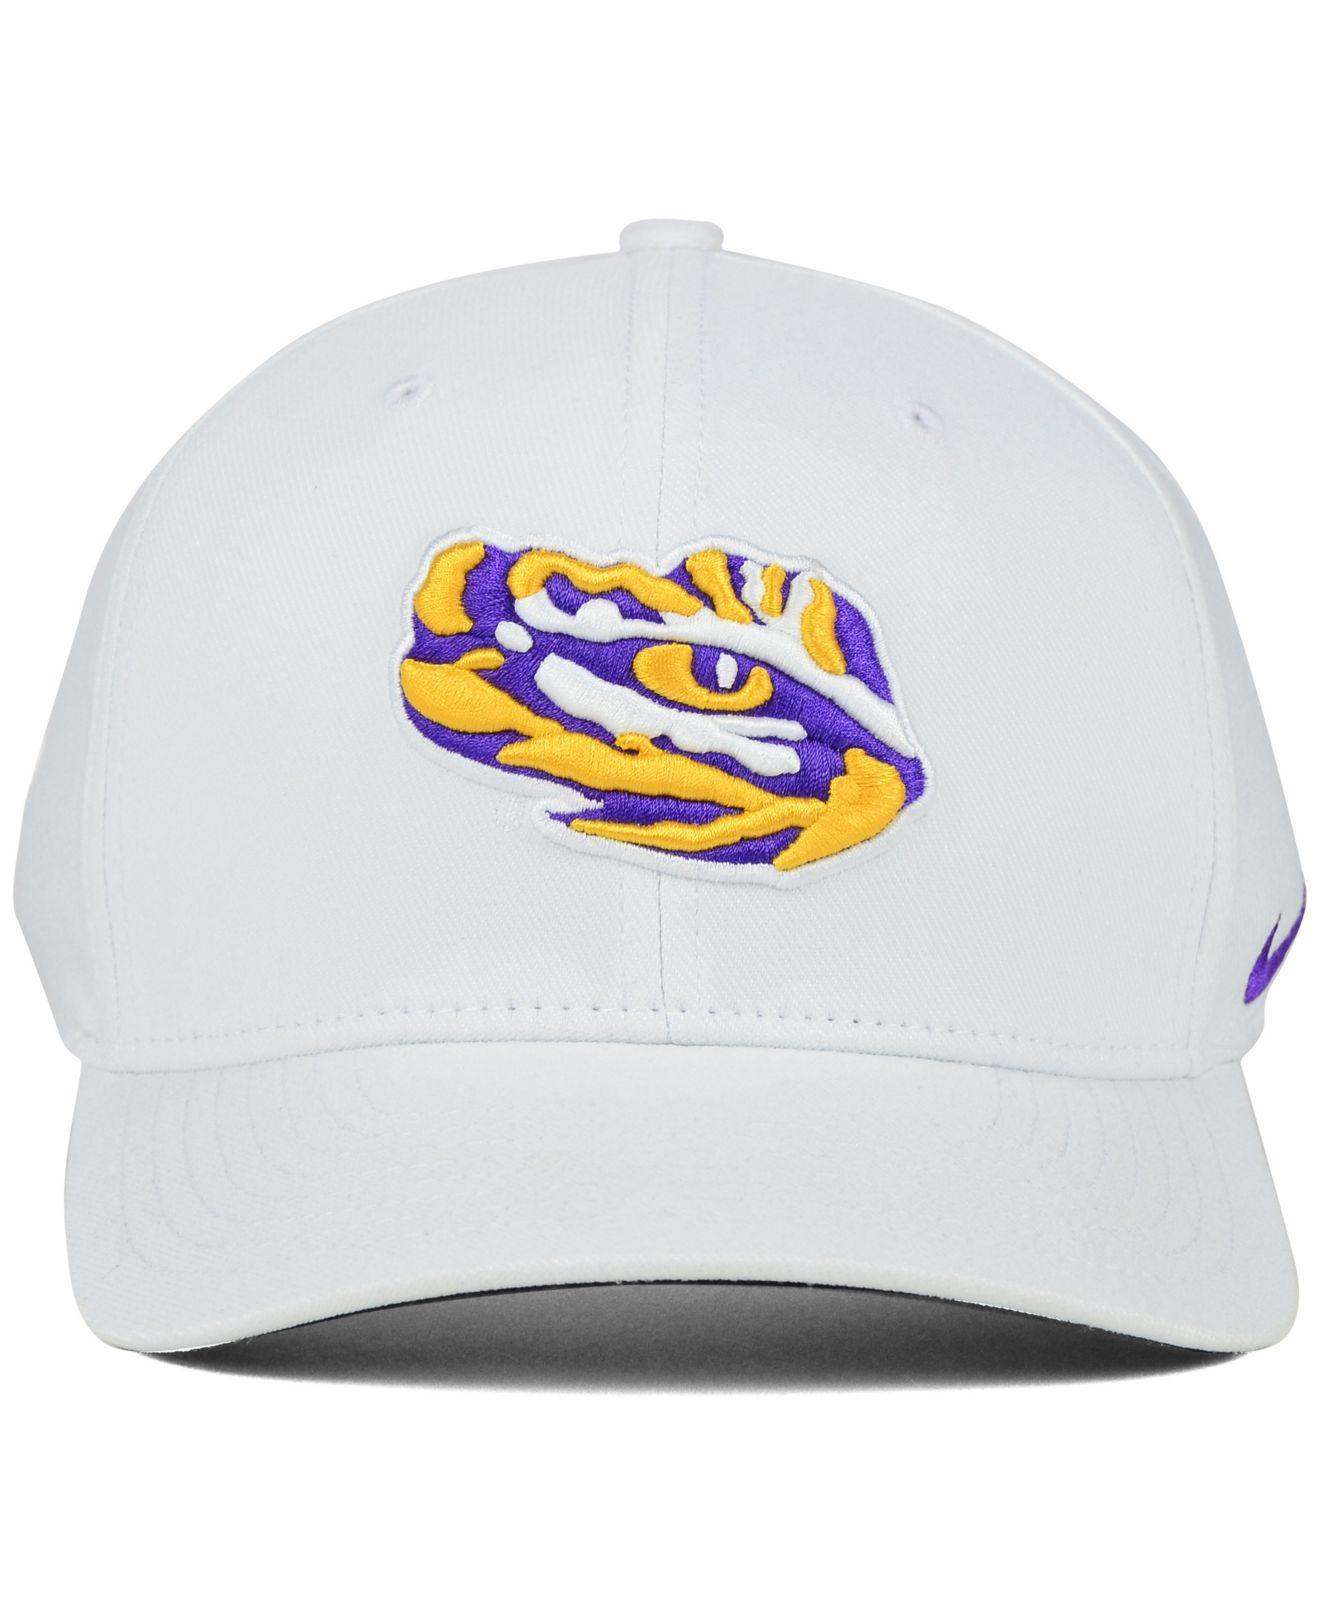 70eb970607dc0 Nike Lsu Tigers Classic Swoosh Cap in White for Men - Lyst